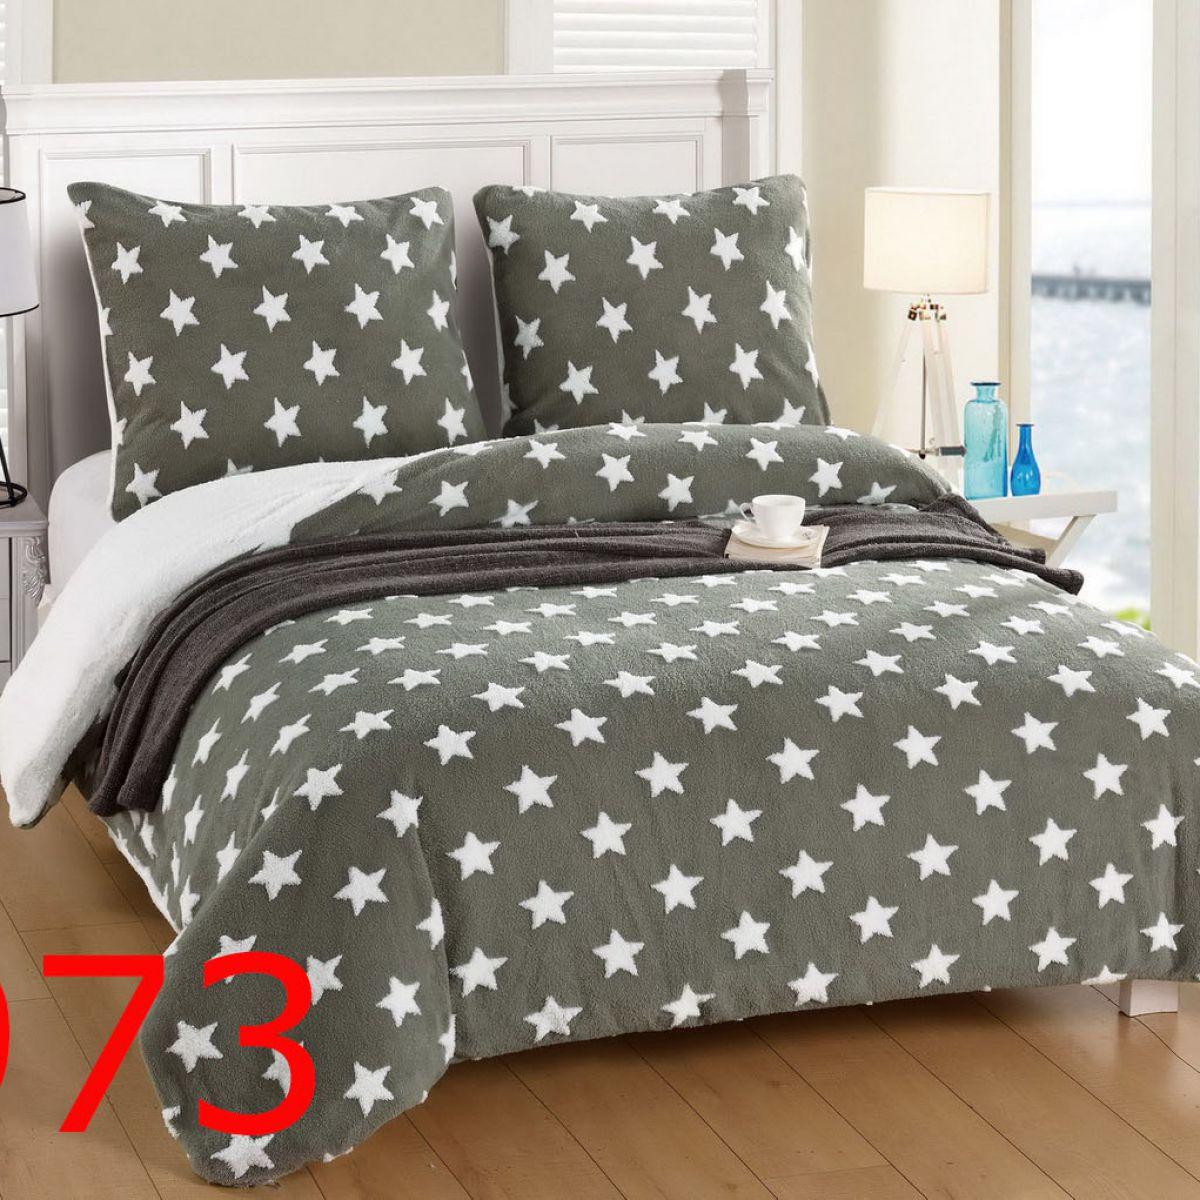 Plush Beddings - Cotton World - SHK-5201 - 160x200 cm - 3 pcs